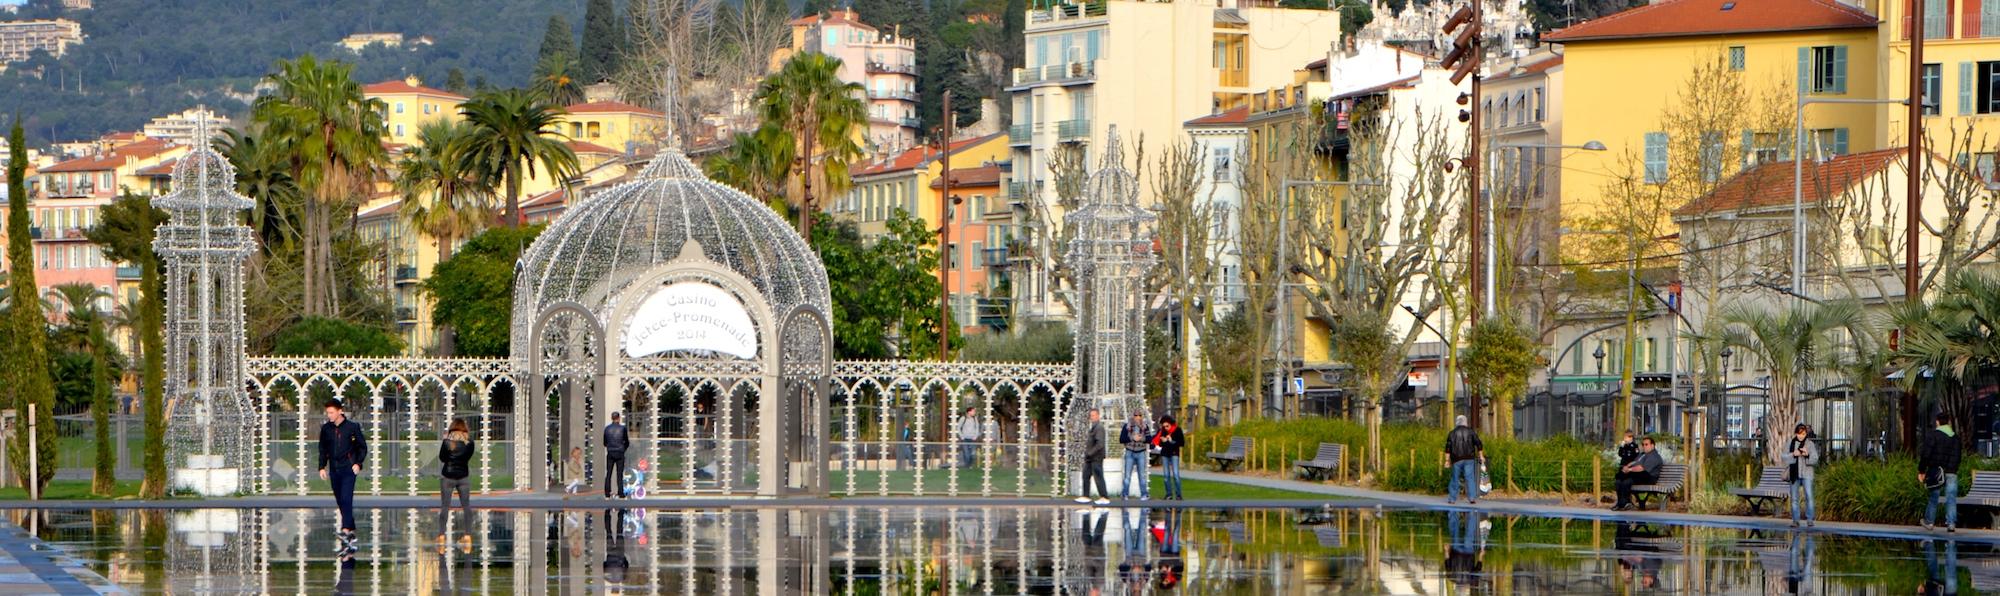 Promenade Paillon, Niza